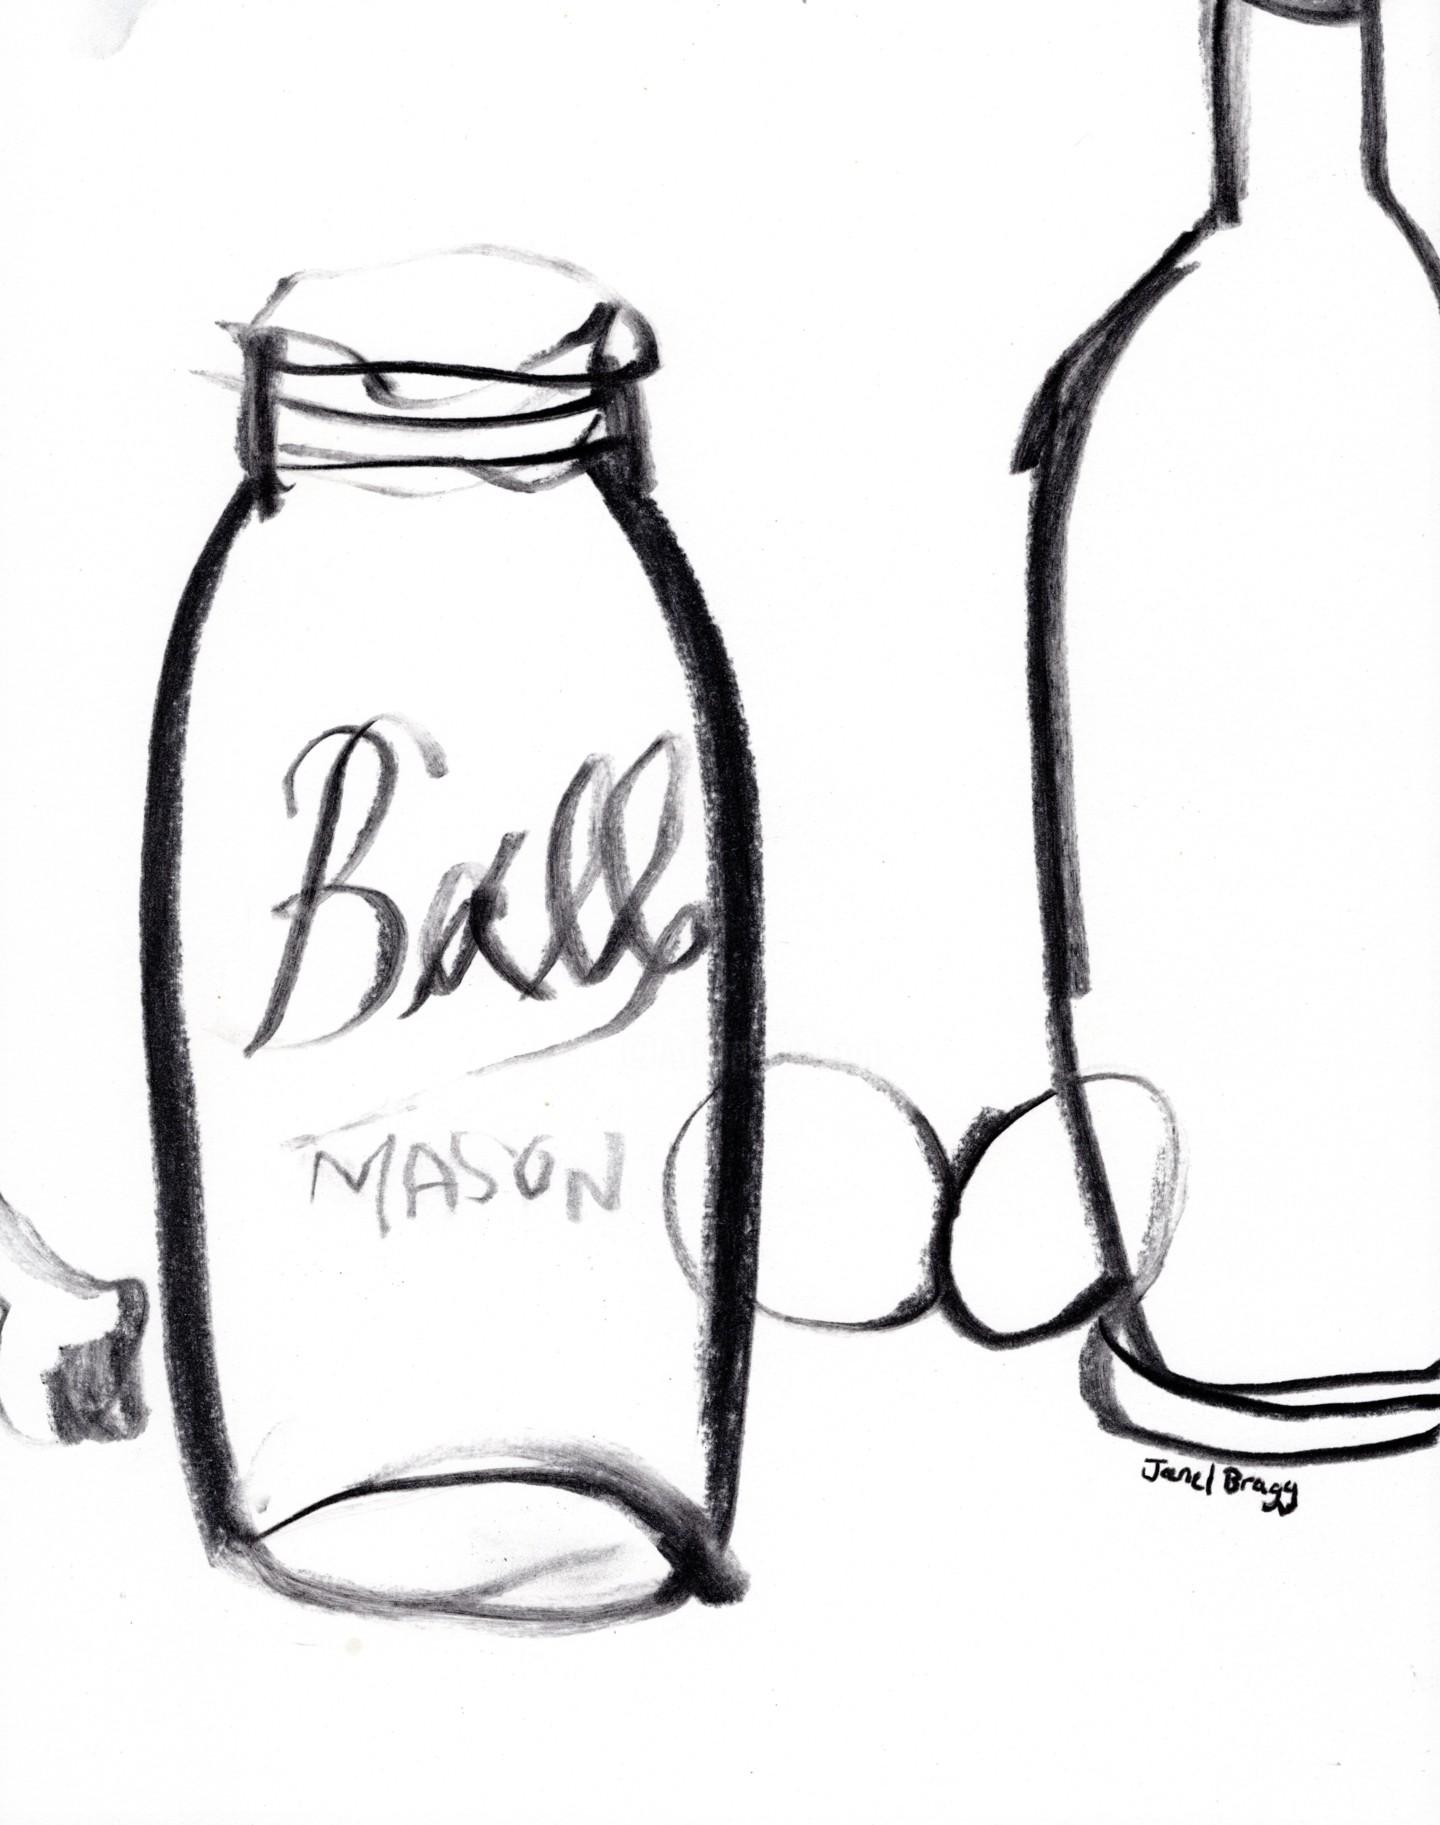 Janel Bragg - Still Life with Ball Mason Jar